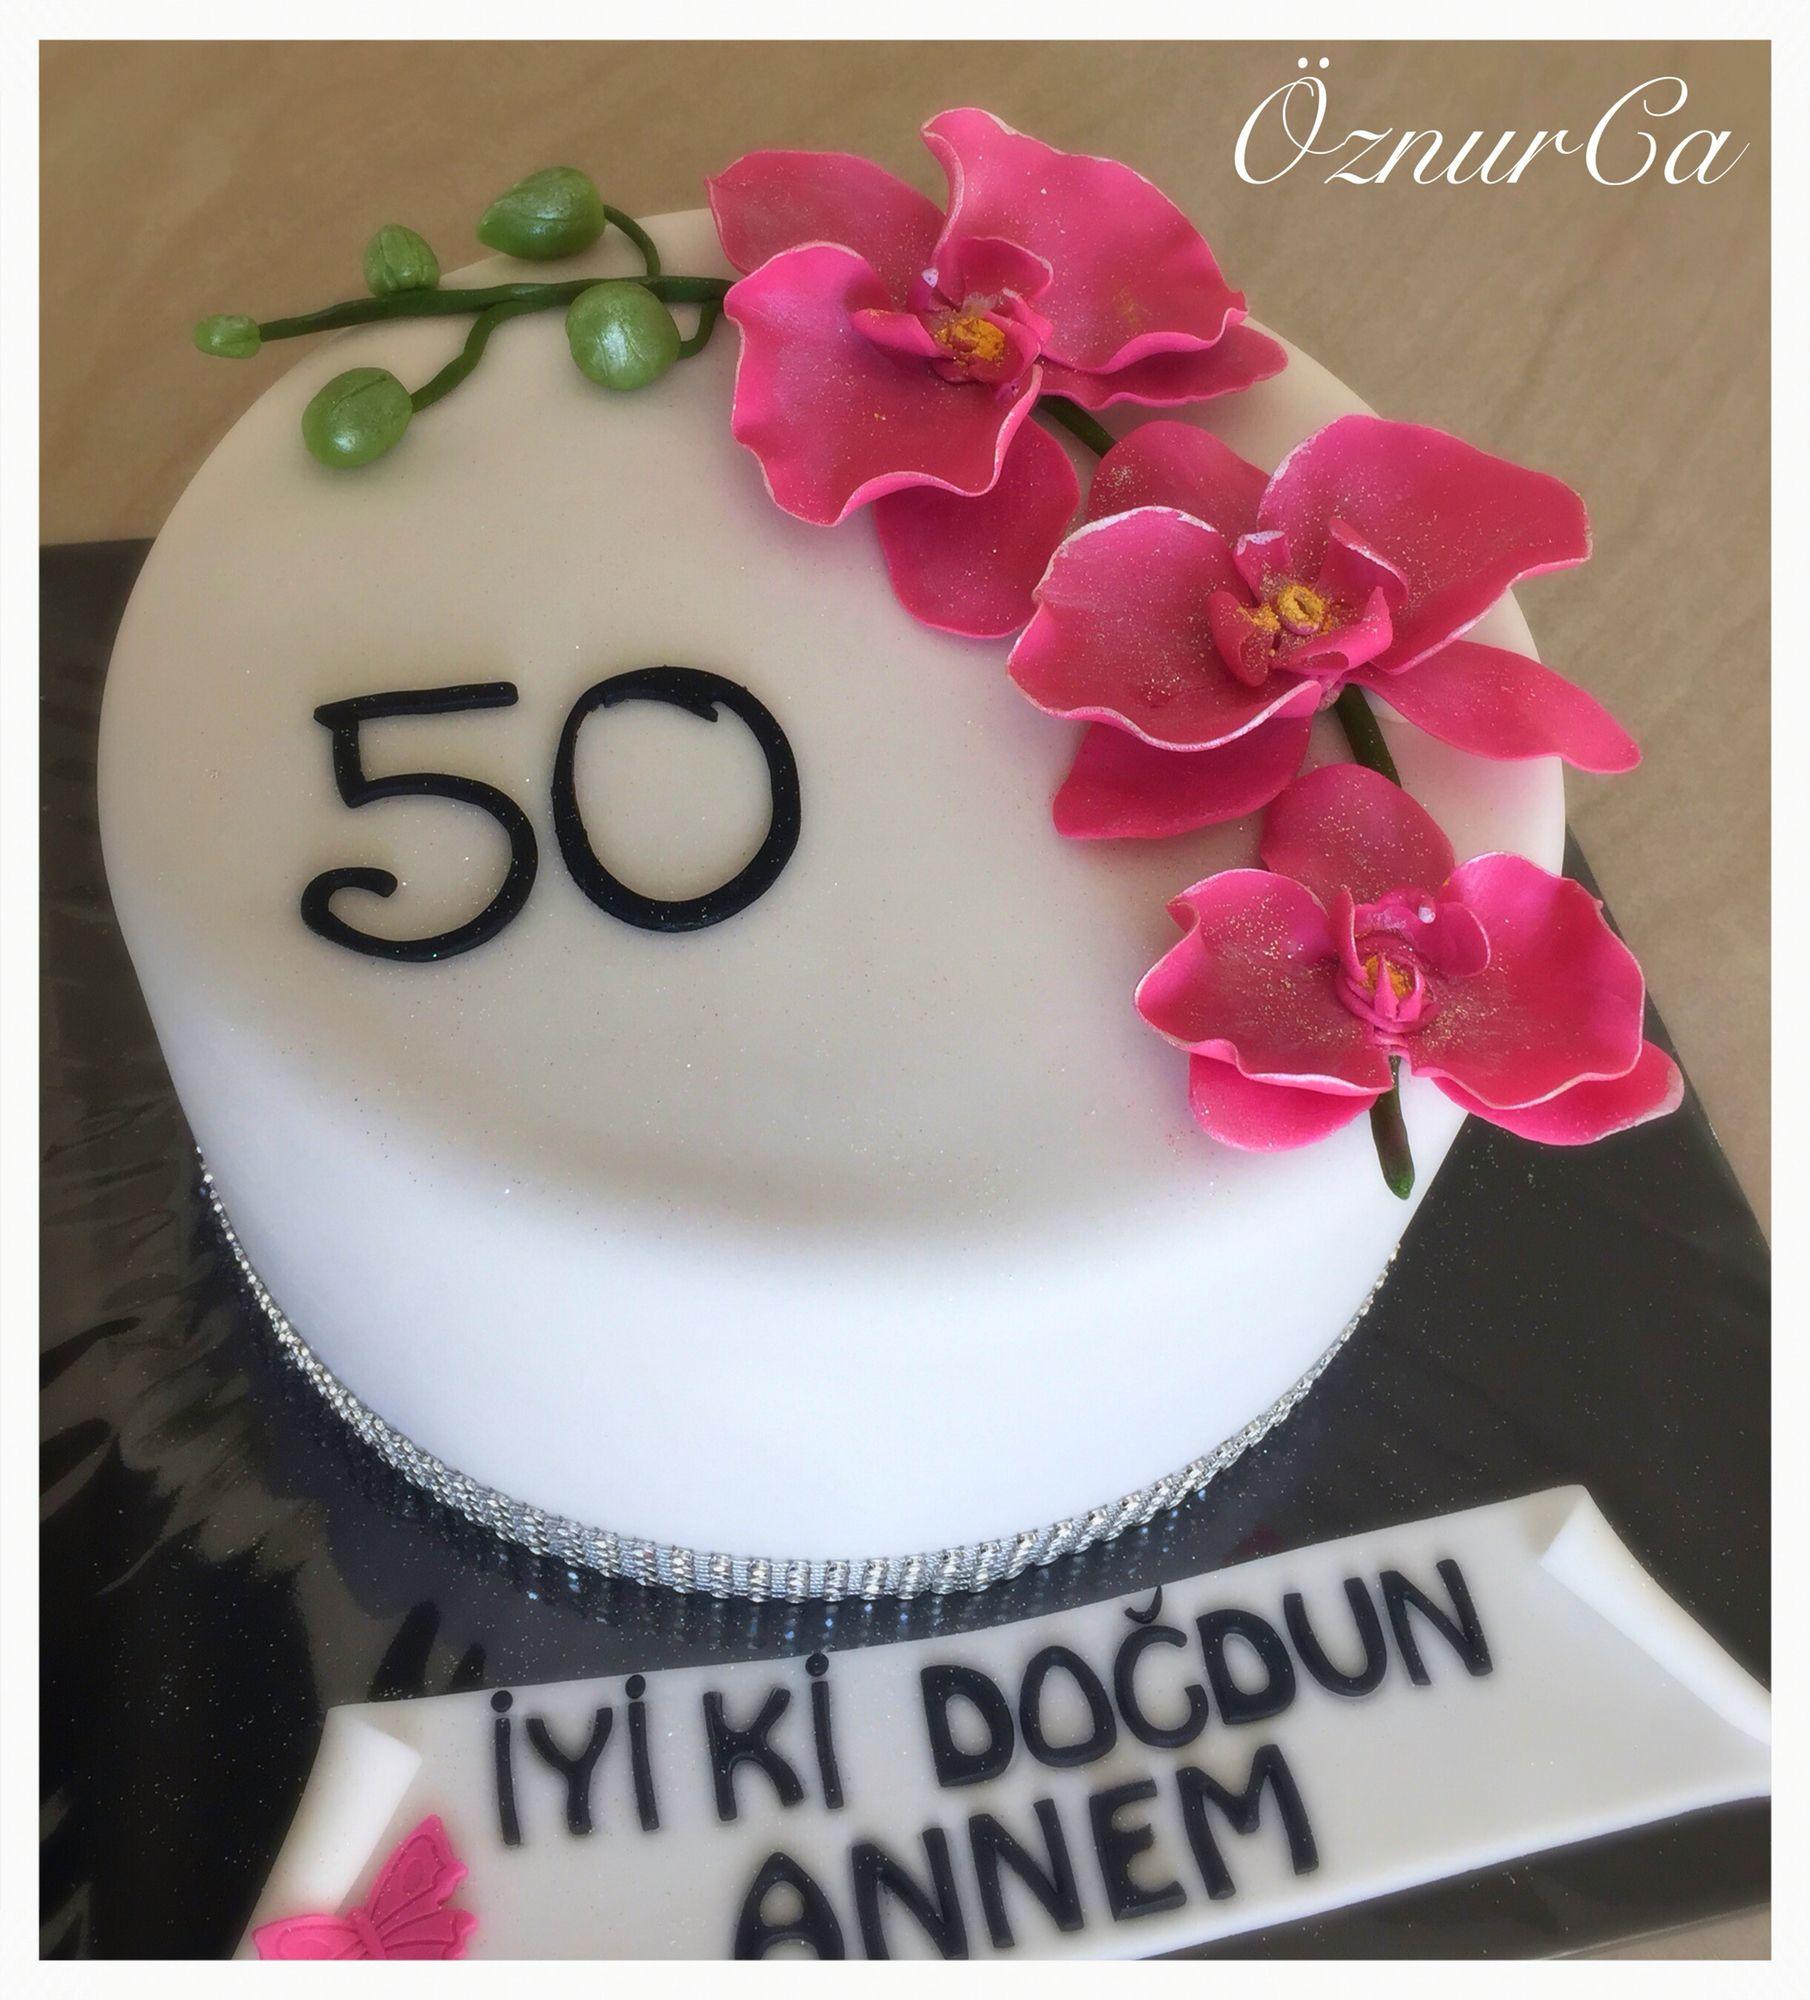 Orchideen Torte 50 Geburtstag  Meine Torten  Torte 50